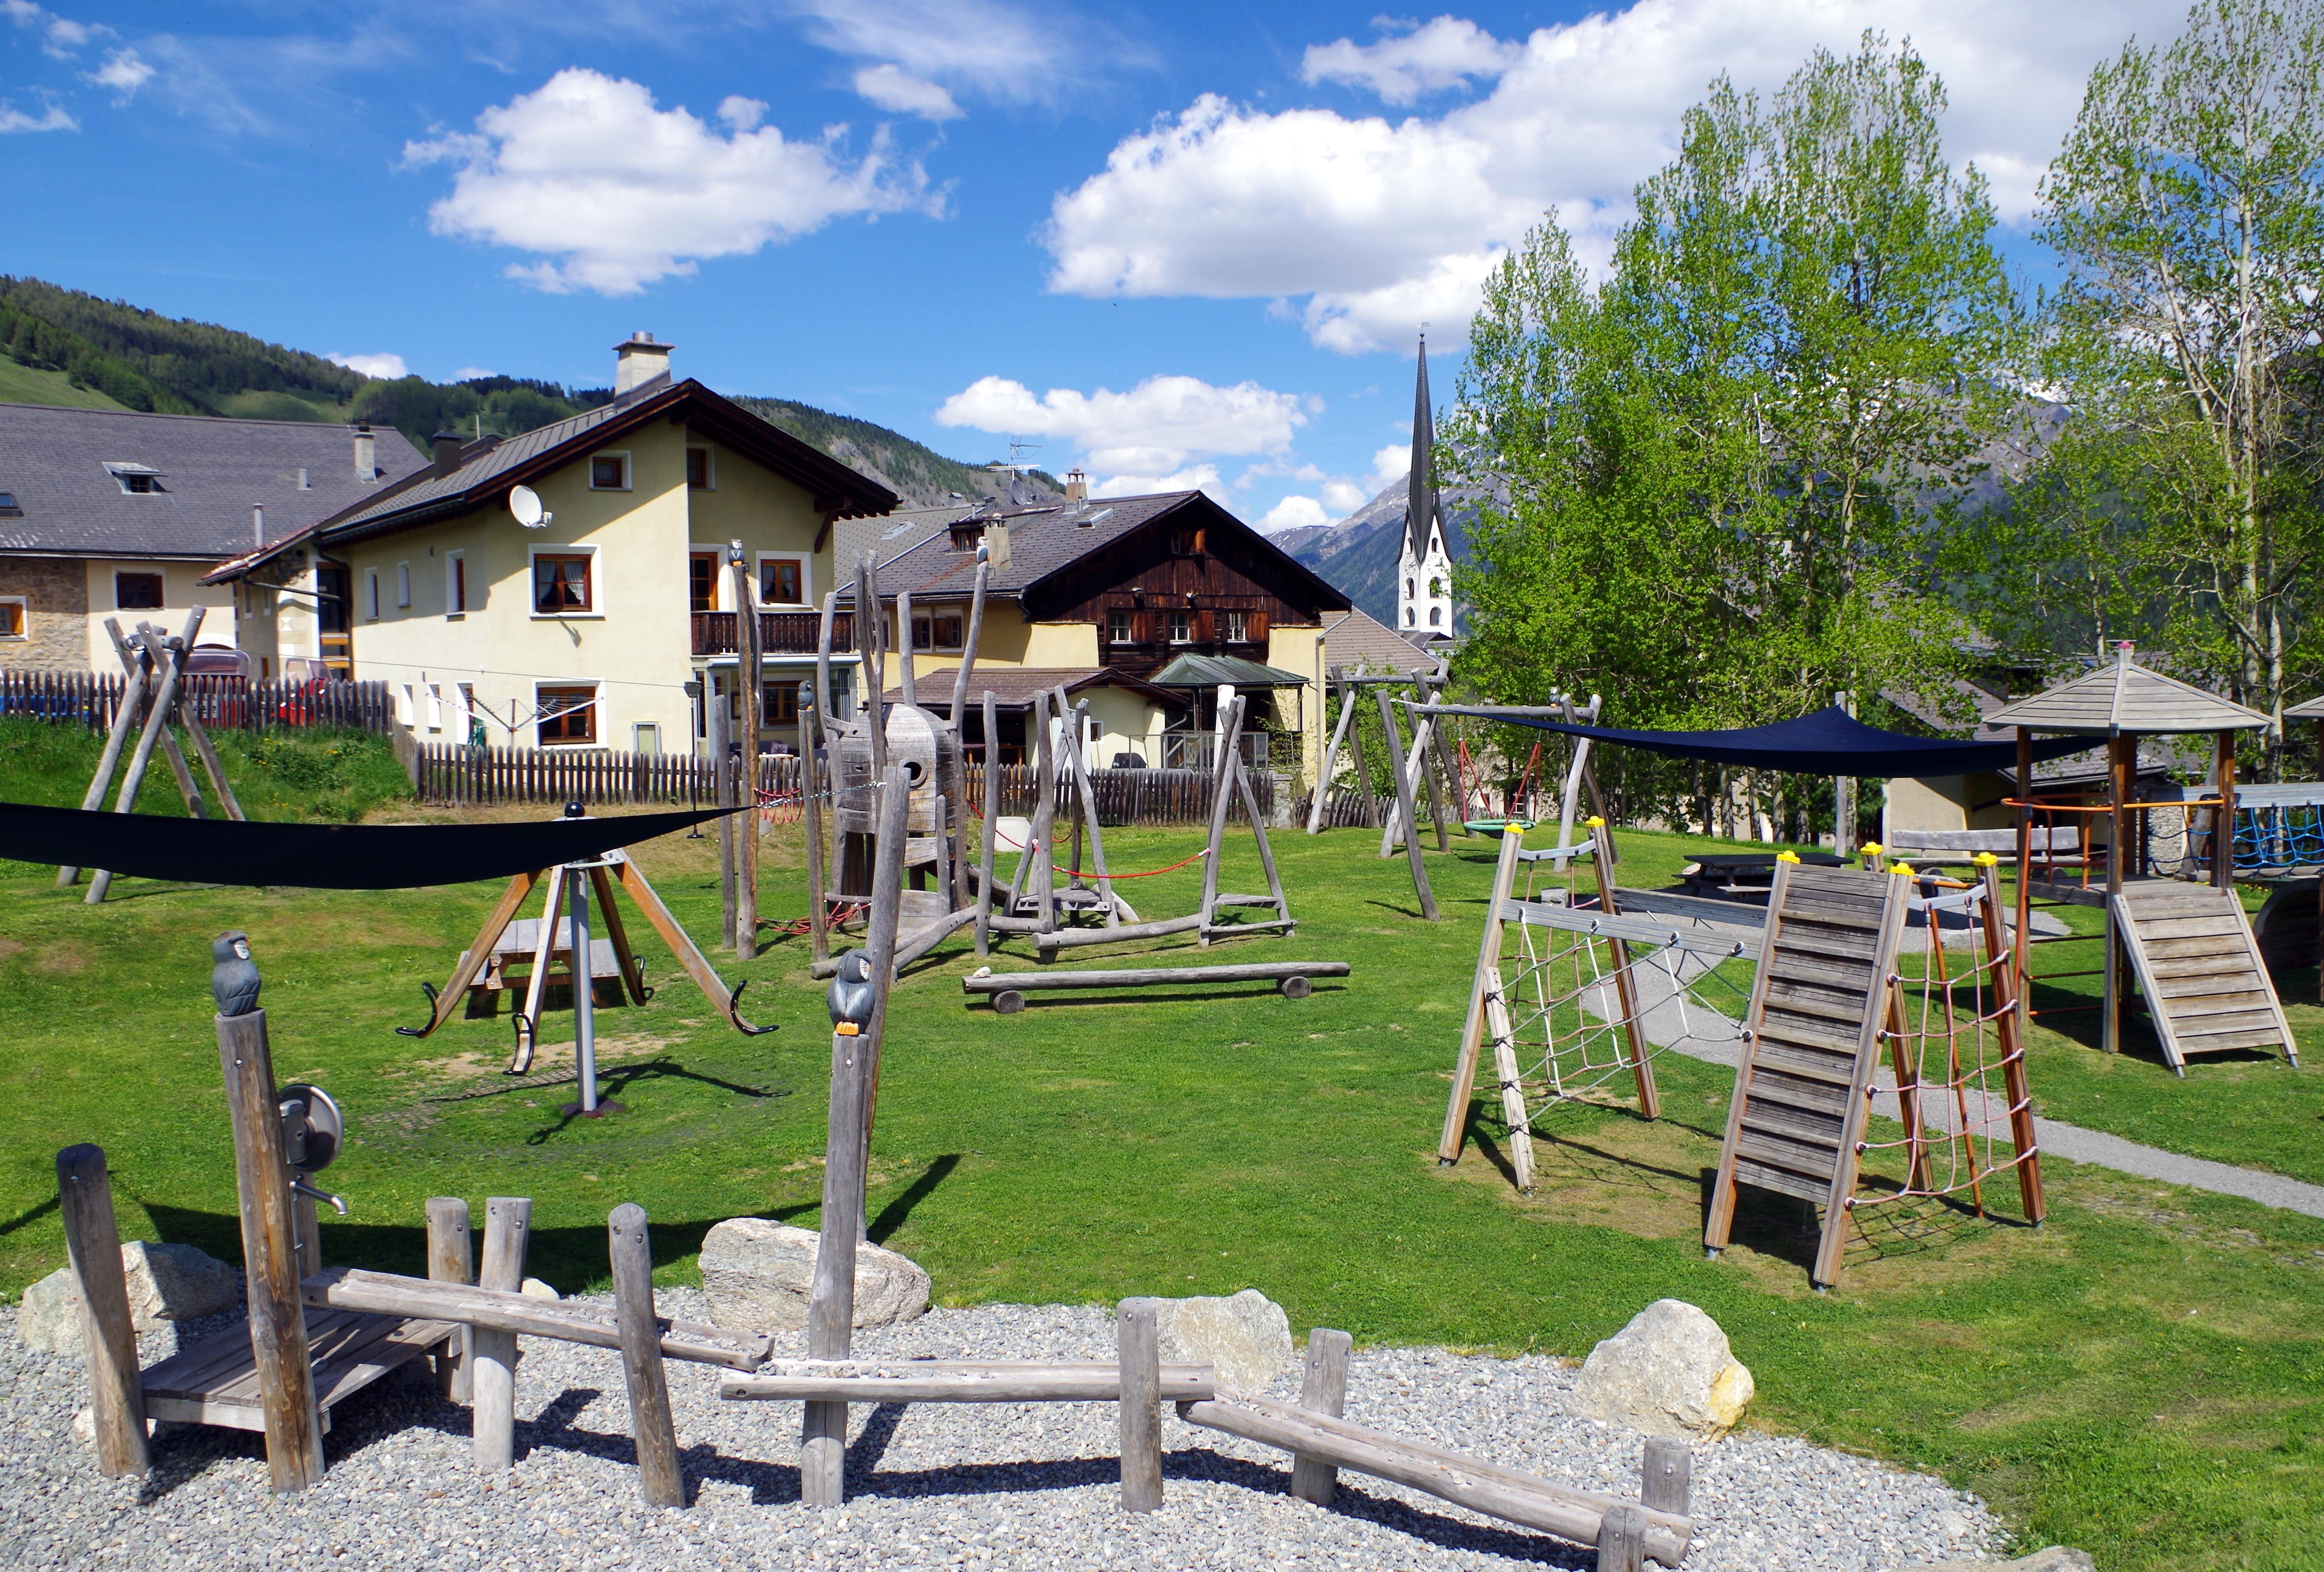 Kinderspielplatz Eulalia Slide 1